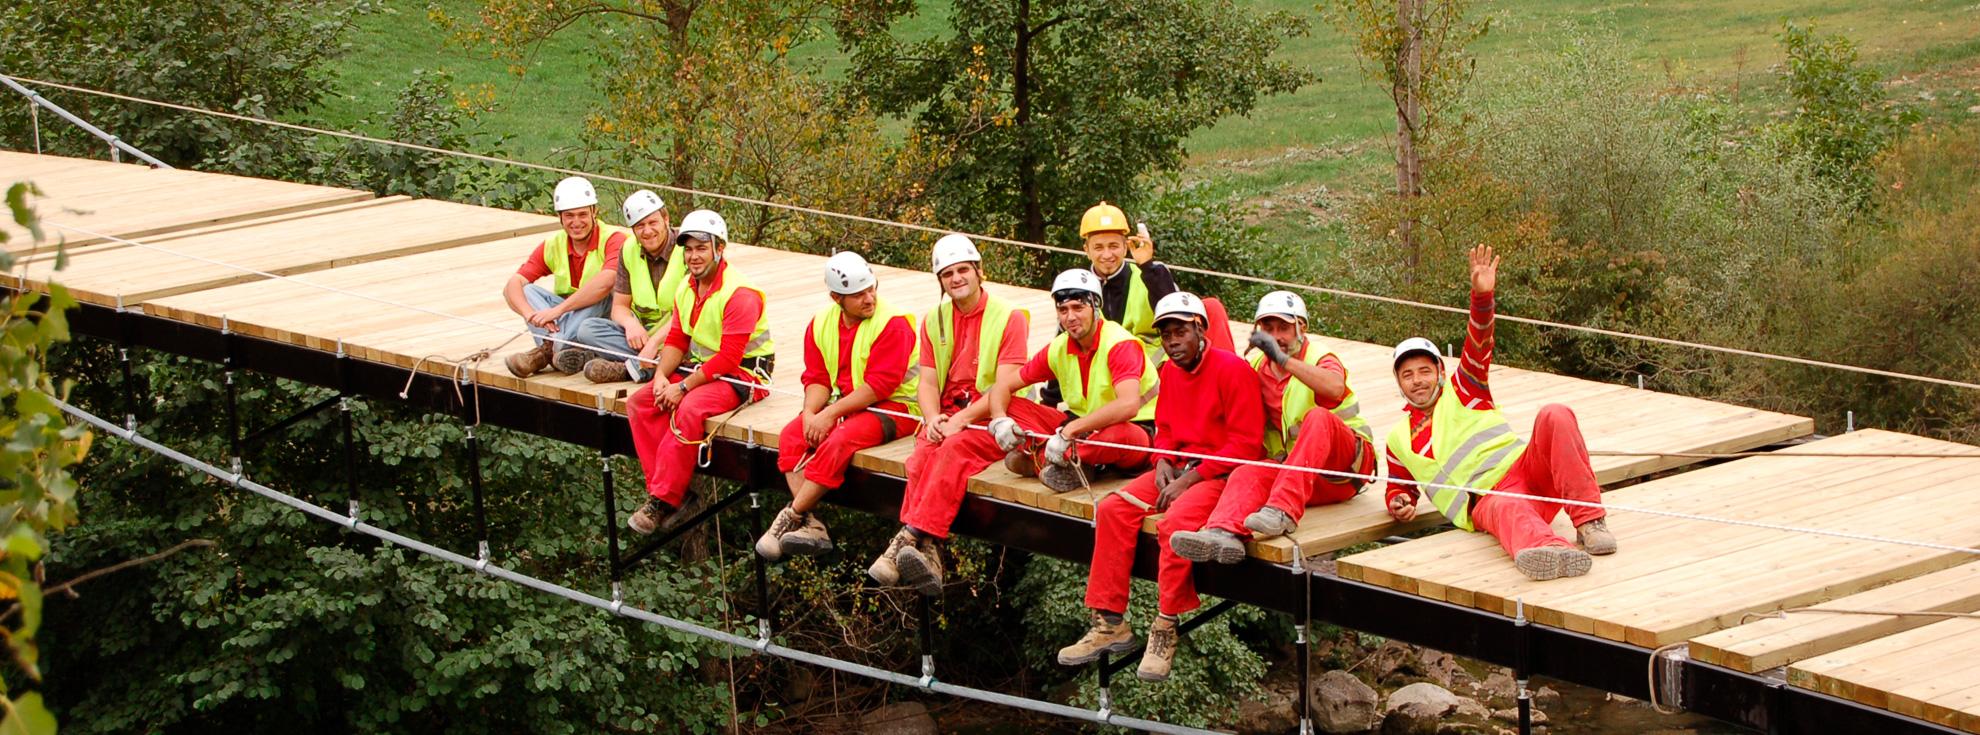 Equipo Puentes Colgantes de iMuntanya